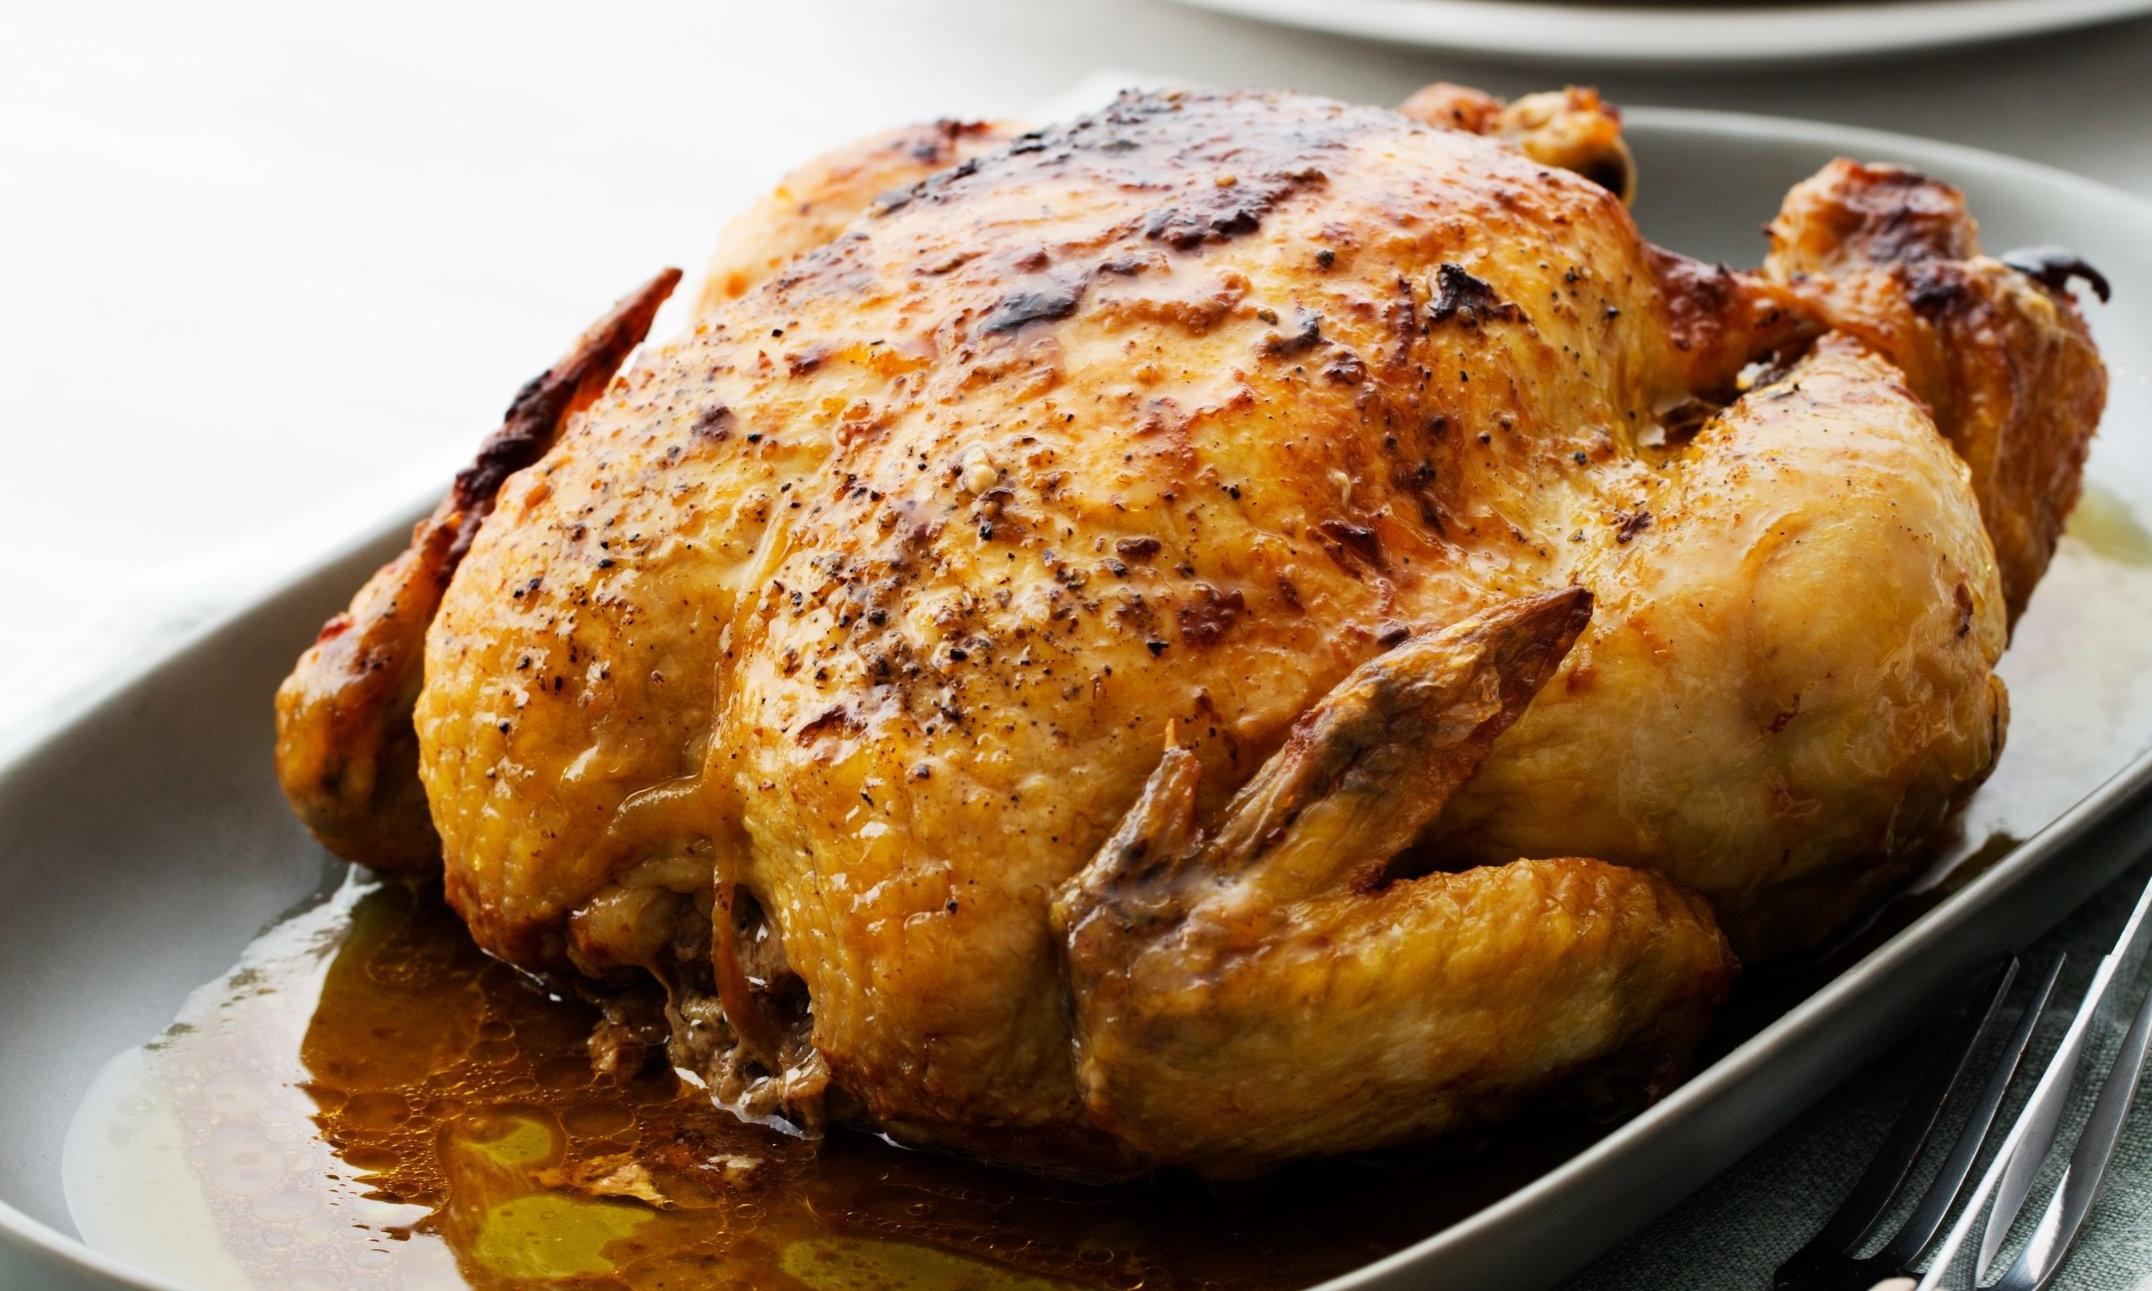 gralic stuffed chicken.jpg